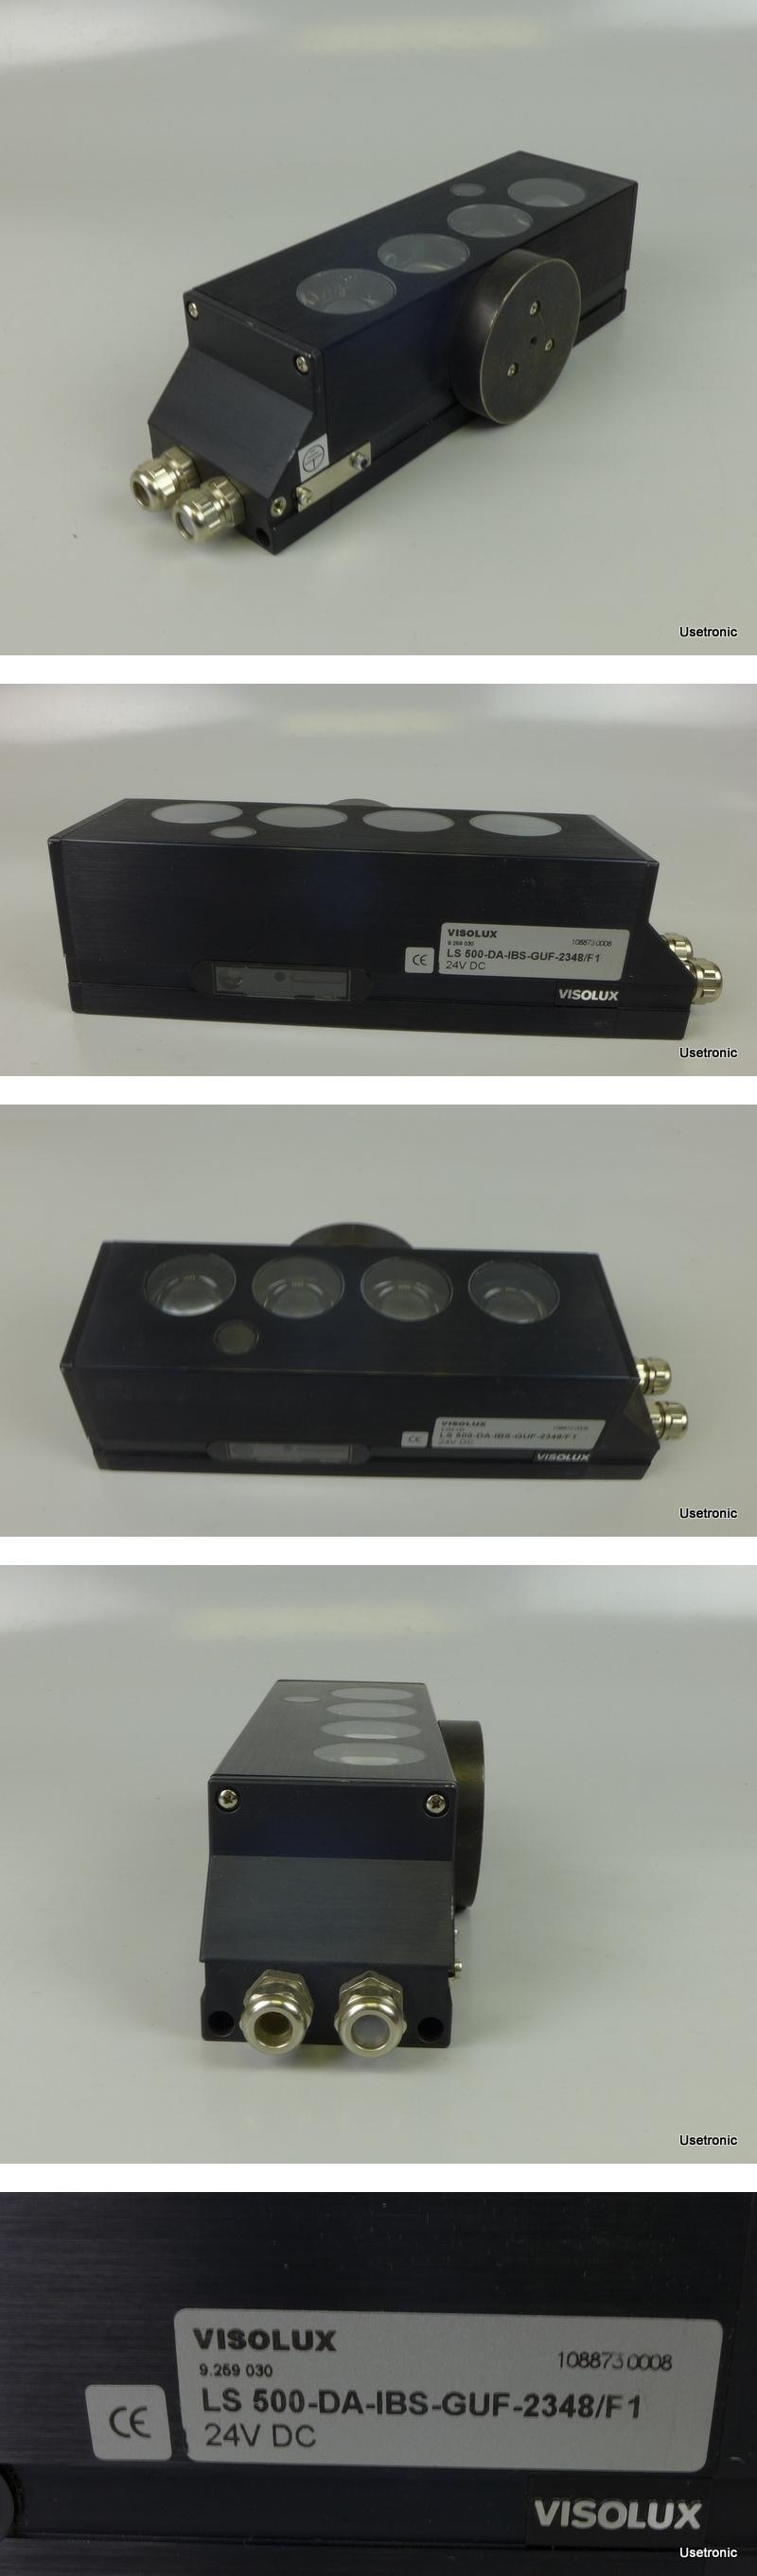 Visolux LS500-DA-IBS-GUF-2348